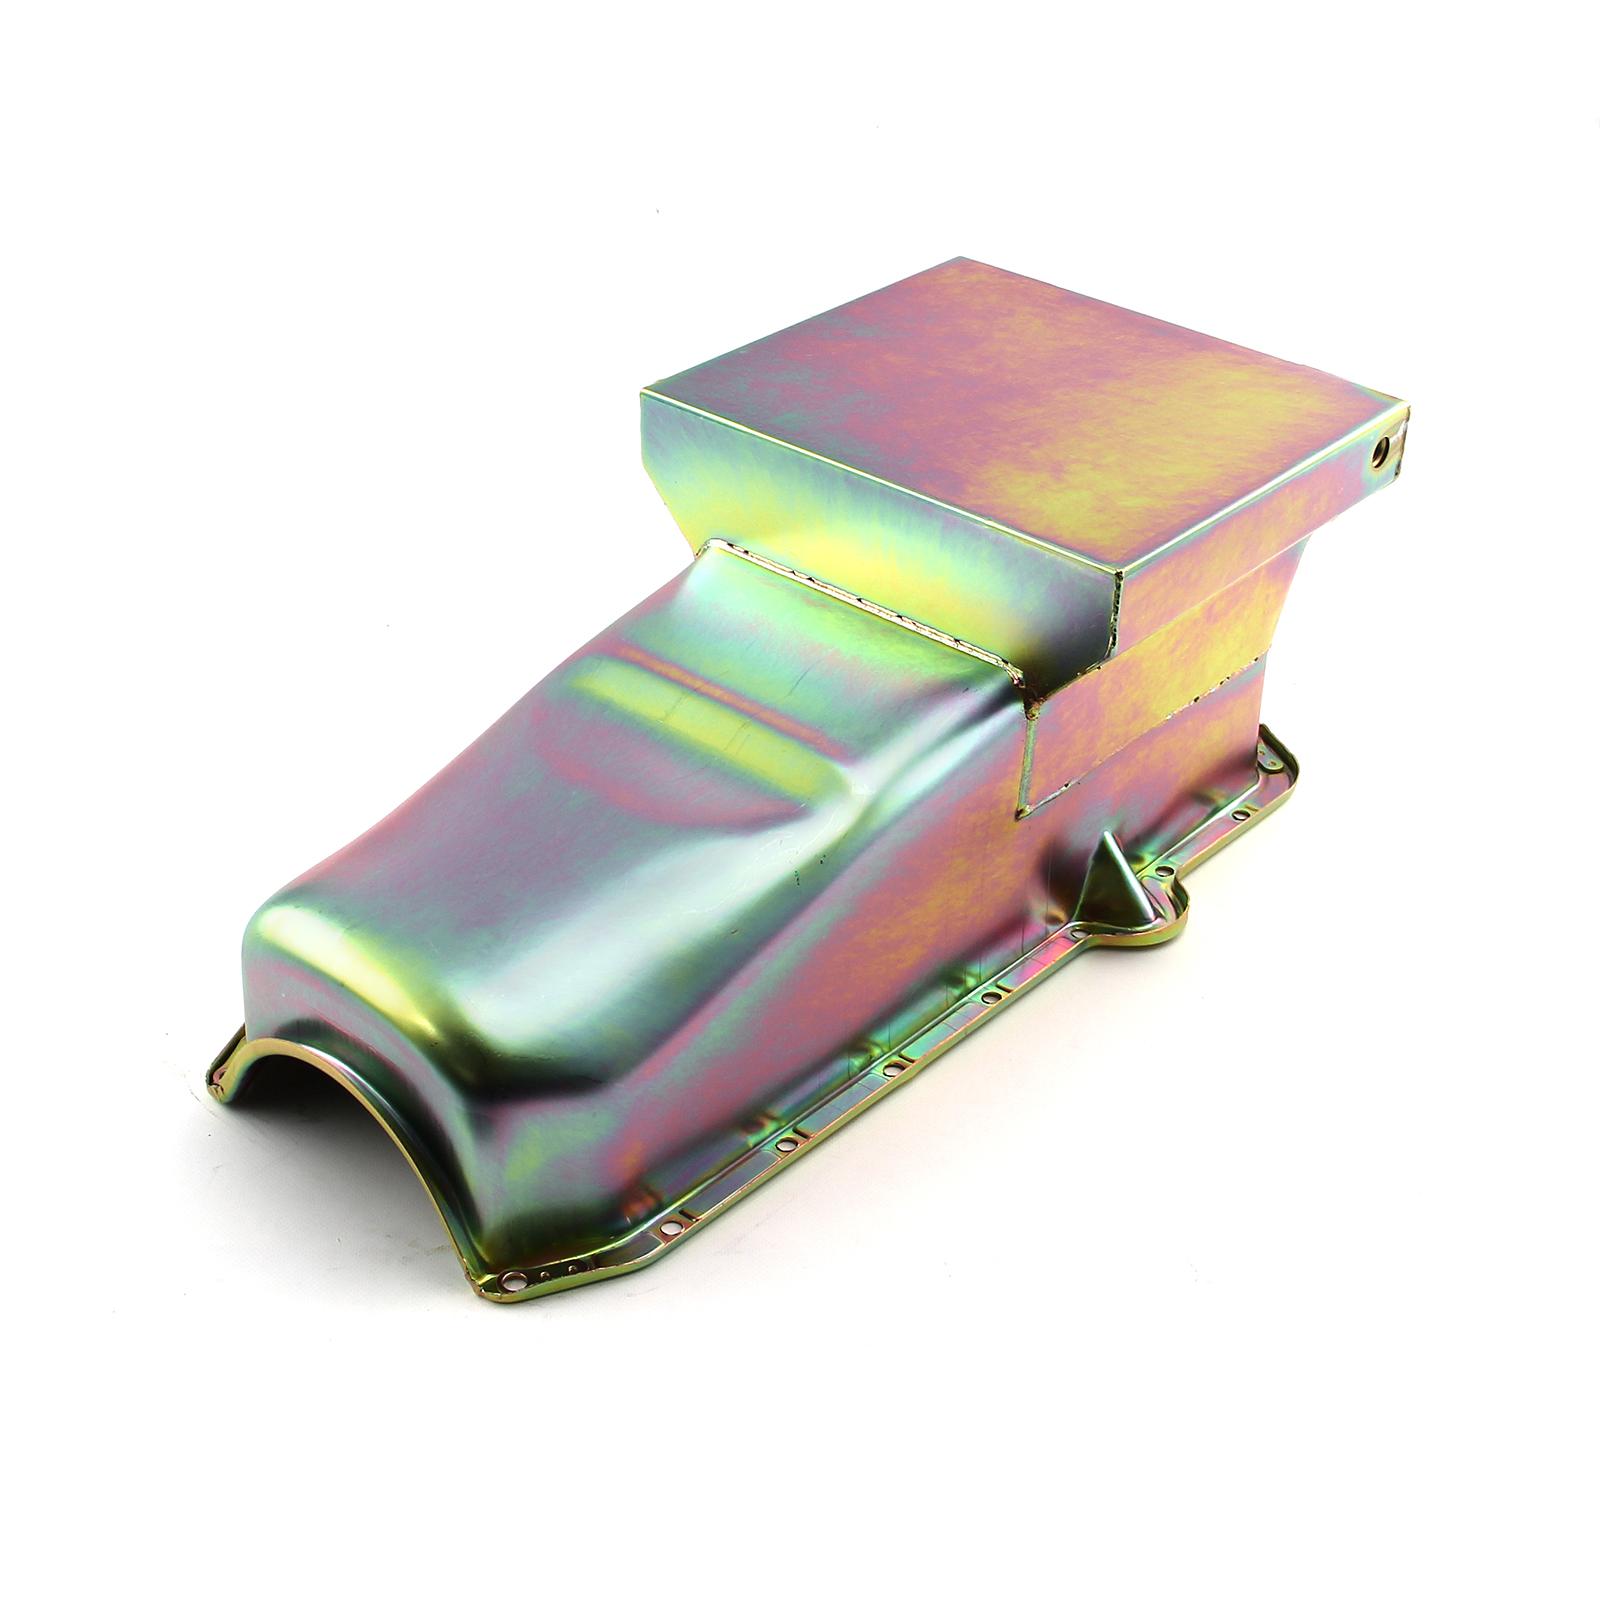 Chevy SBC 350 7Qt Drag Rear Sump RH Side 2Pcs Rms Zinc Oil Pan